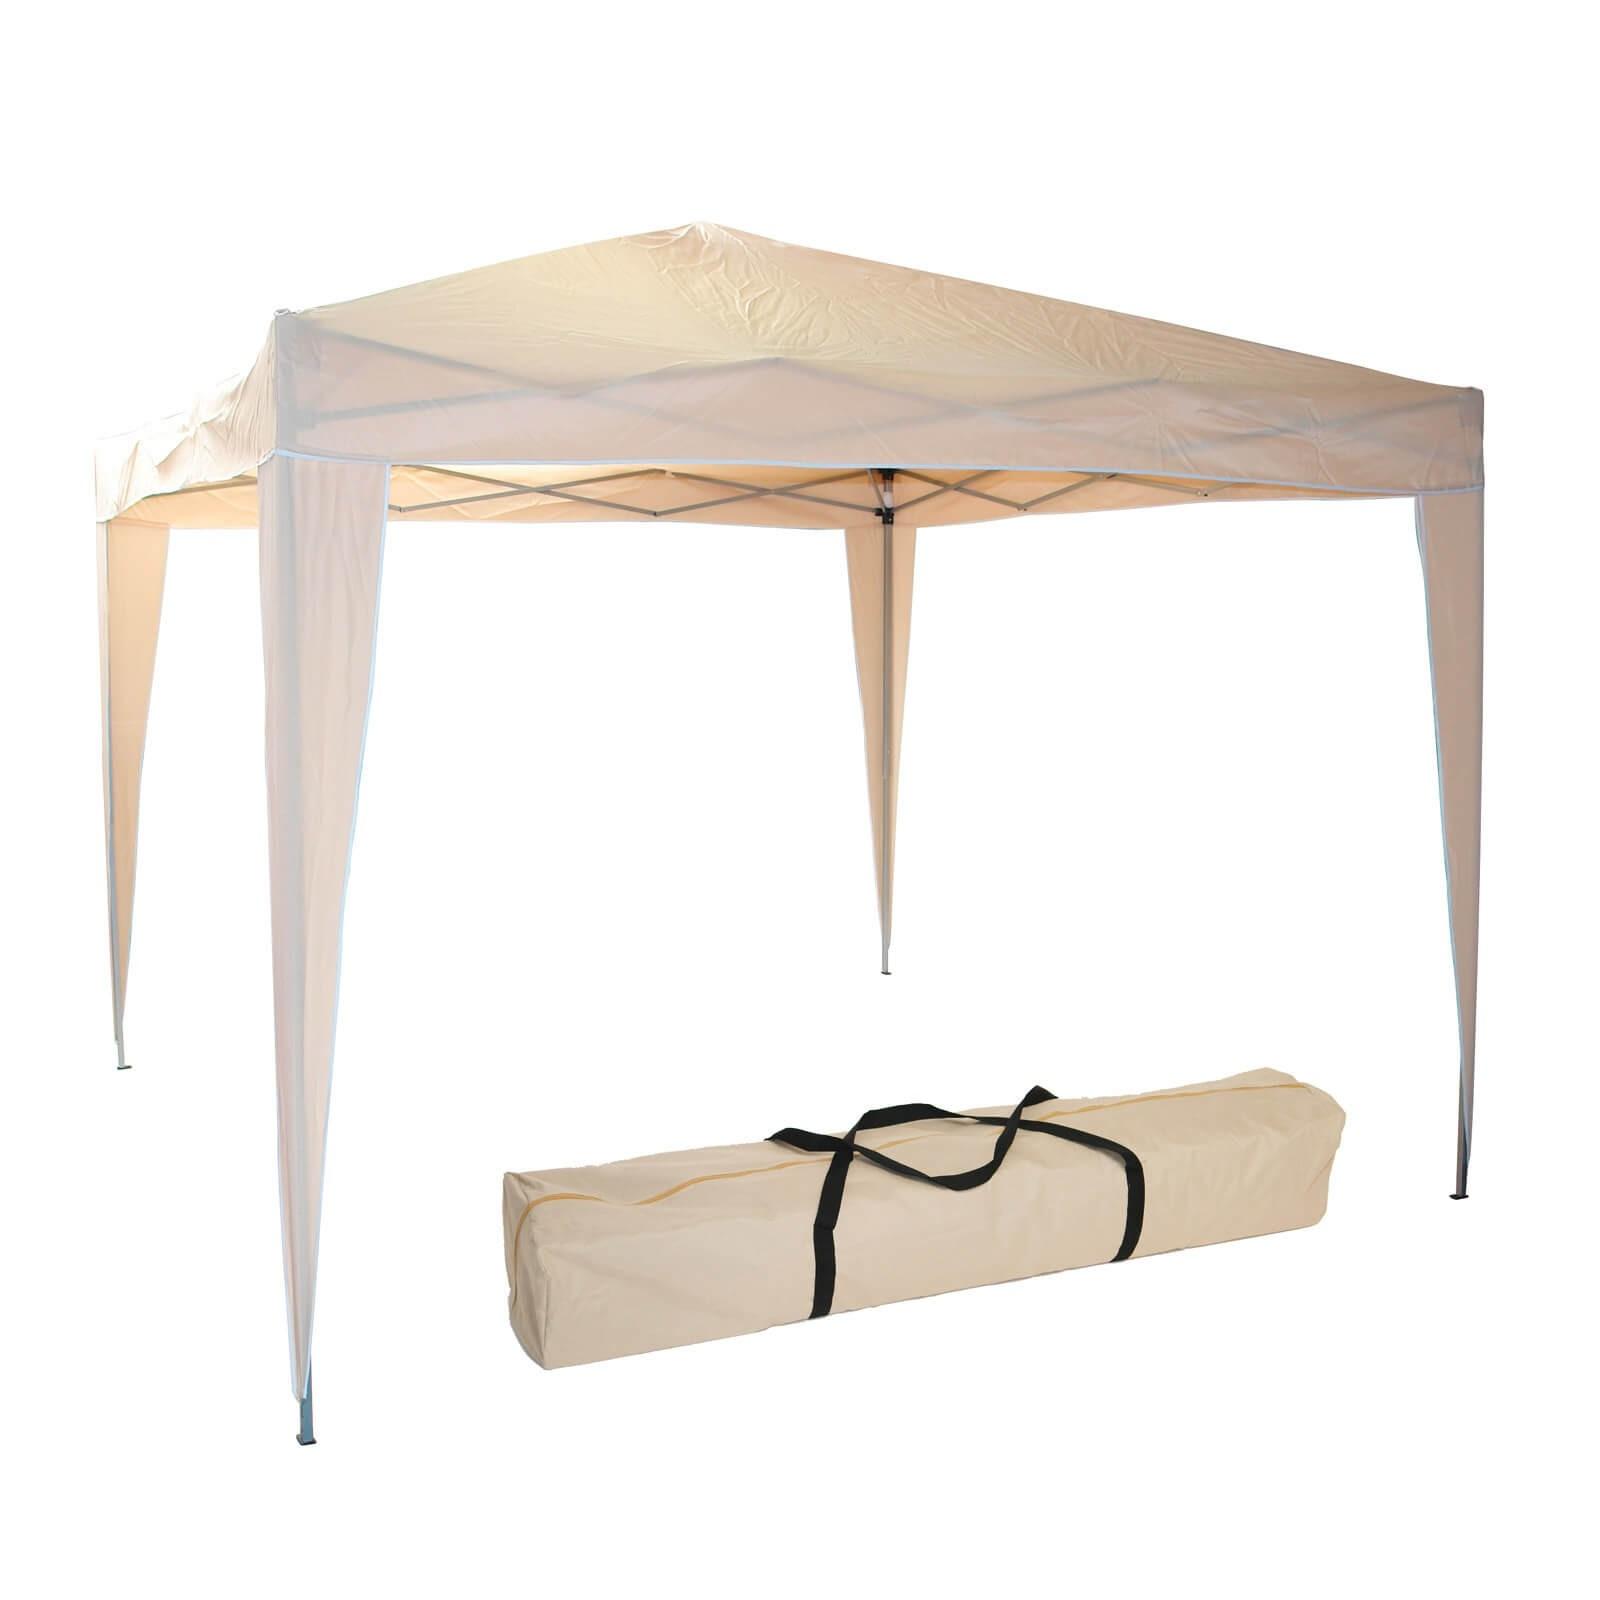 gartenpavillon faltpavillon alu 300 x 300 x 260 cm beige. Black Bedroom Furniture Sets. Home Design Ideas